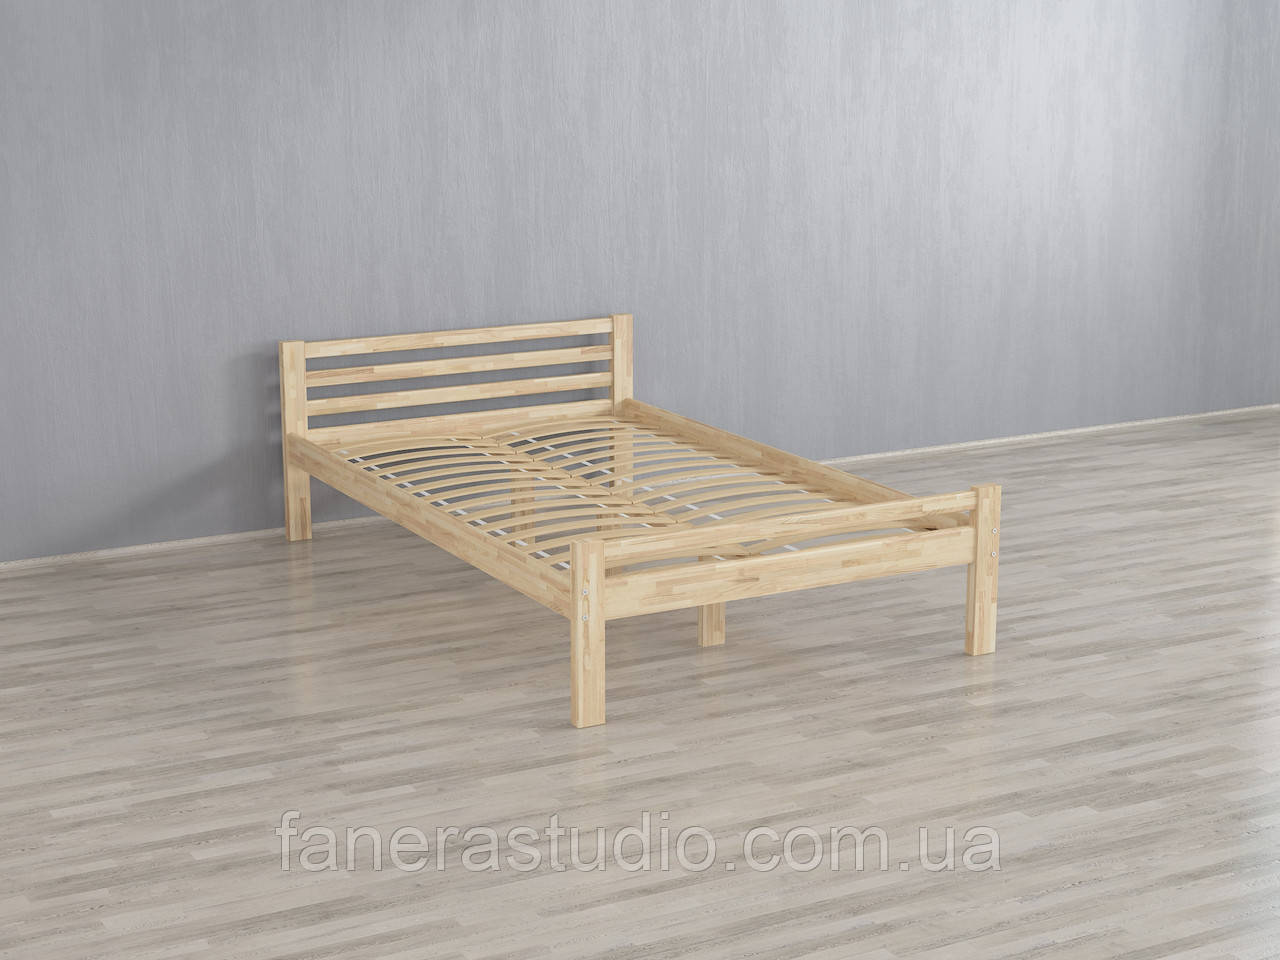 Ліжко полуторне односпальне 200 * 120 см